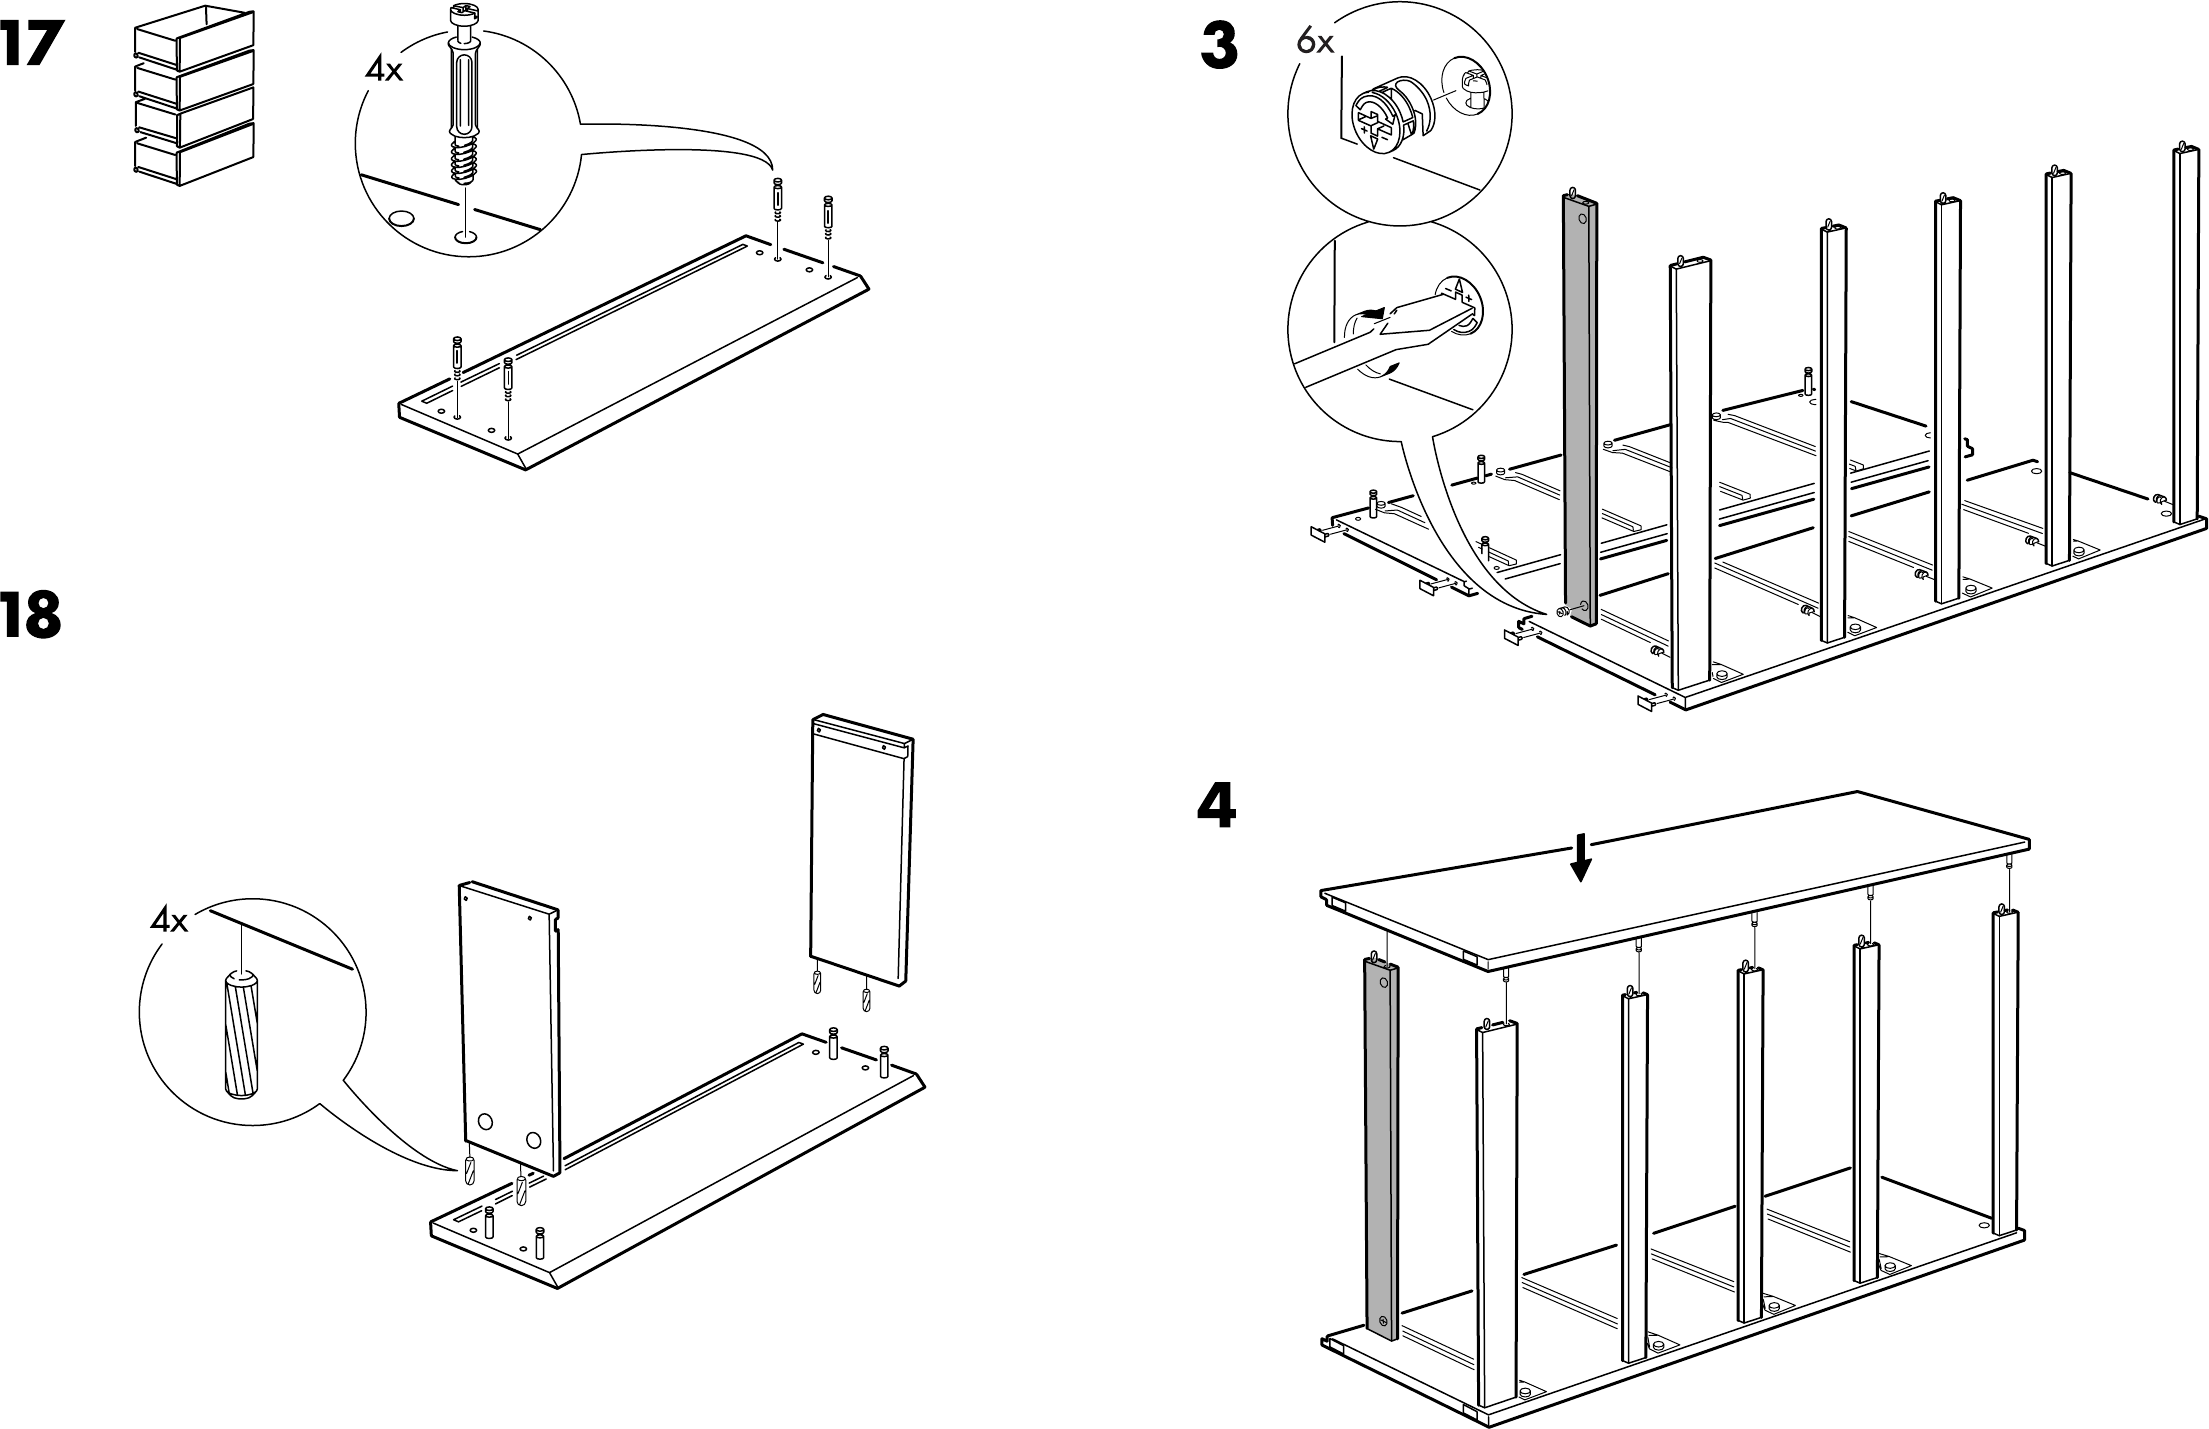 Ikea Malm Ladekast Handleiding.Handleiding Ikea Malm Ladekast 4 Pagina 8 Van 8 Dansk